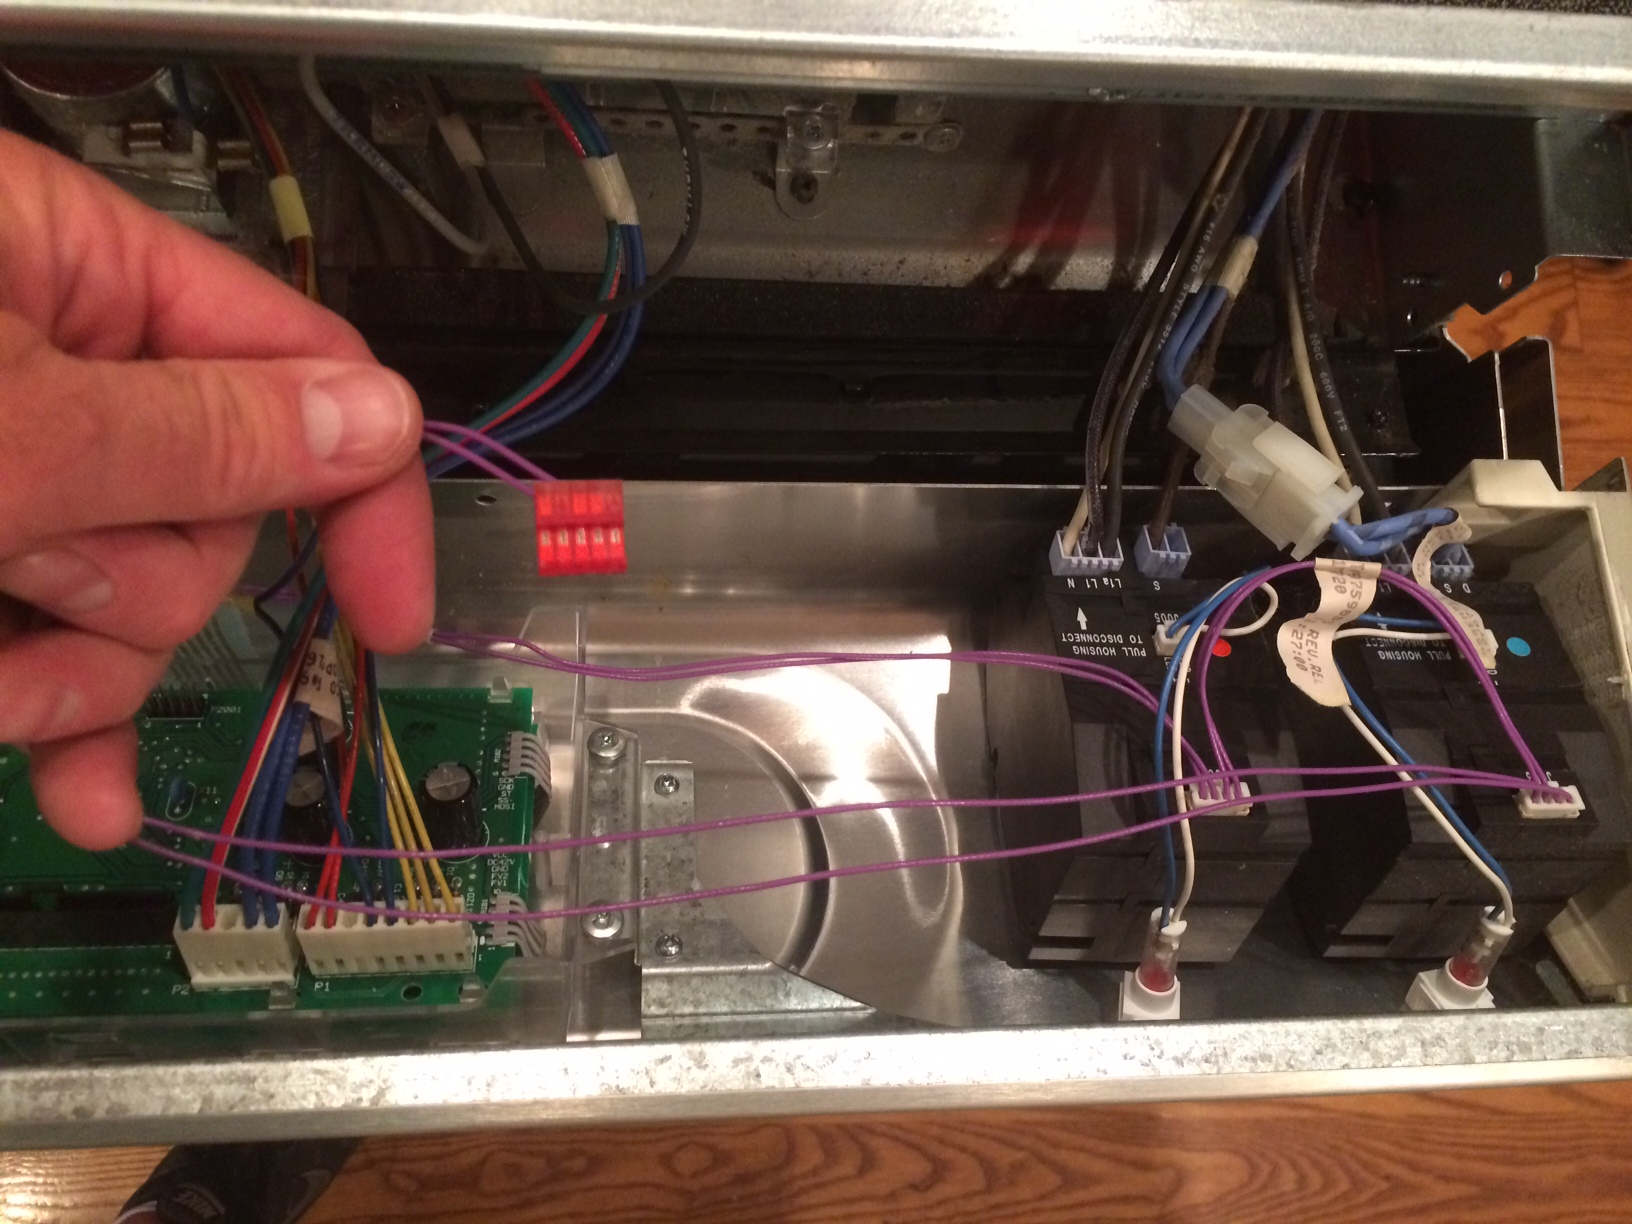 I Have A Kitchenaid Stove Model Kera807pss00 Serial